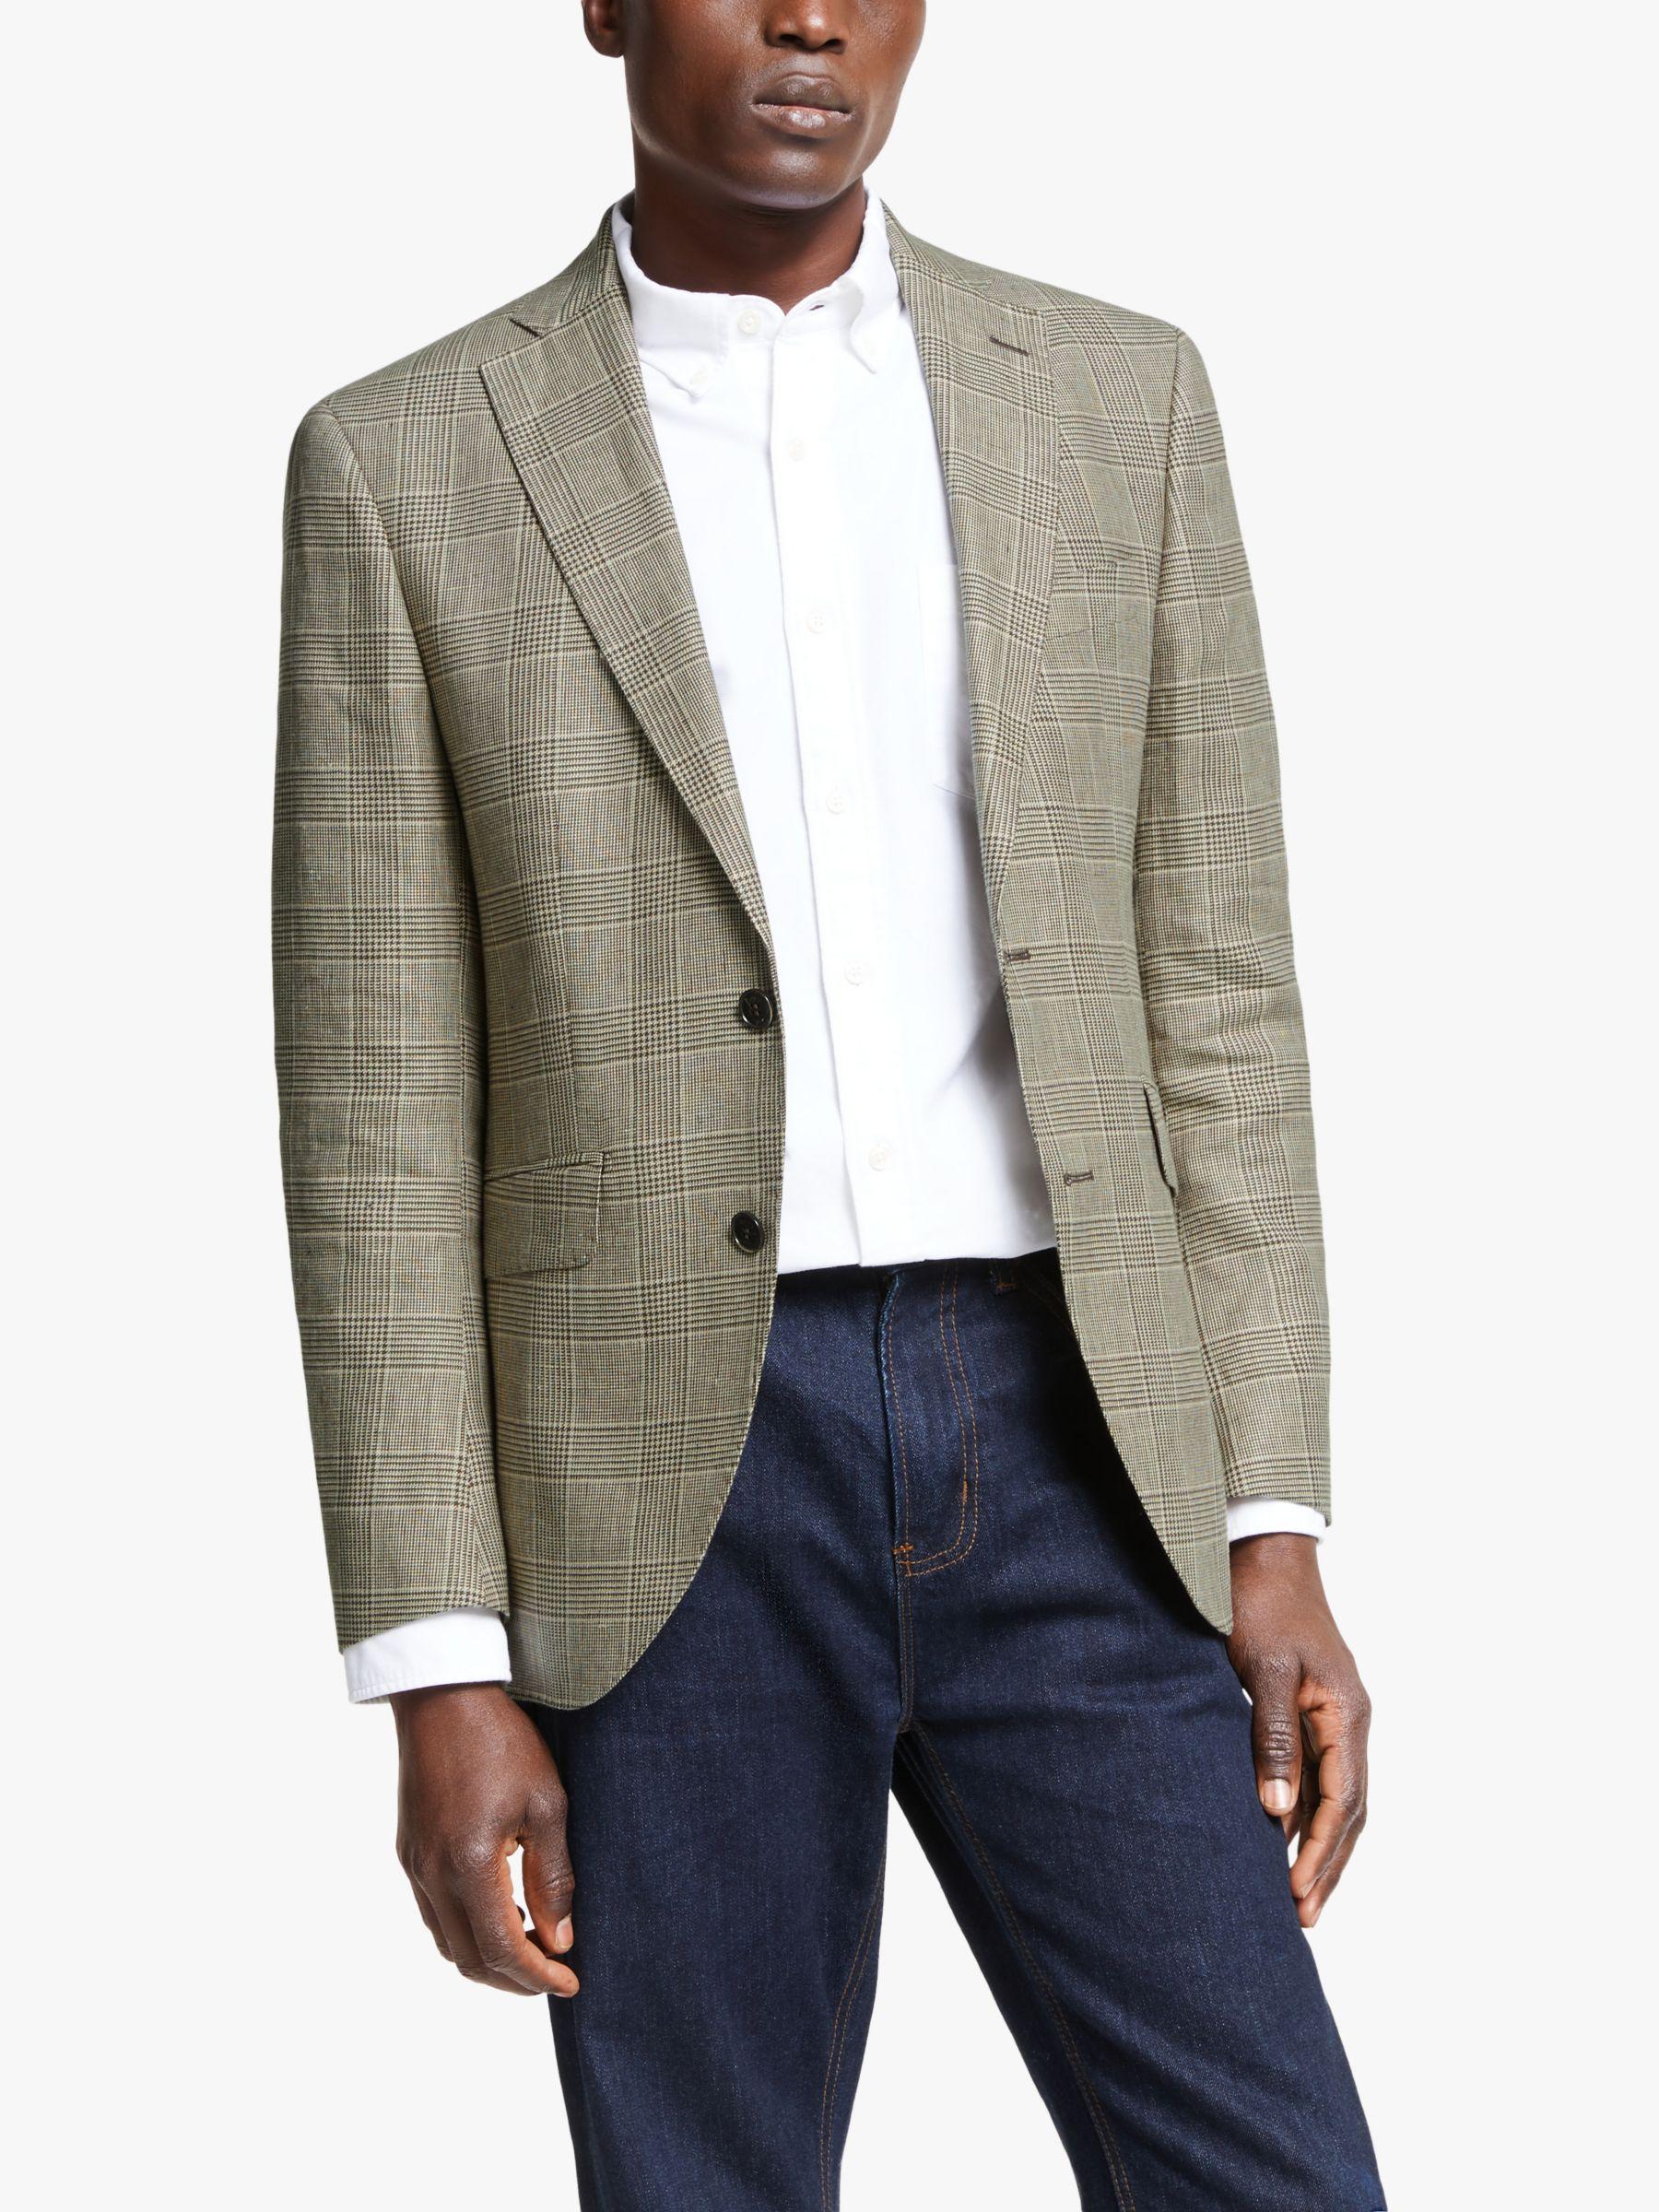 Hackett London Hackett London Linen Cotton Check Blazer, Beige/Brown